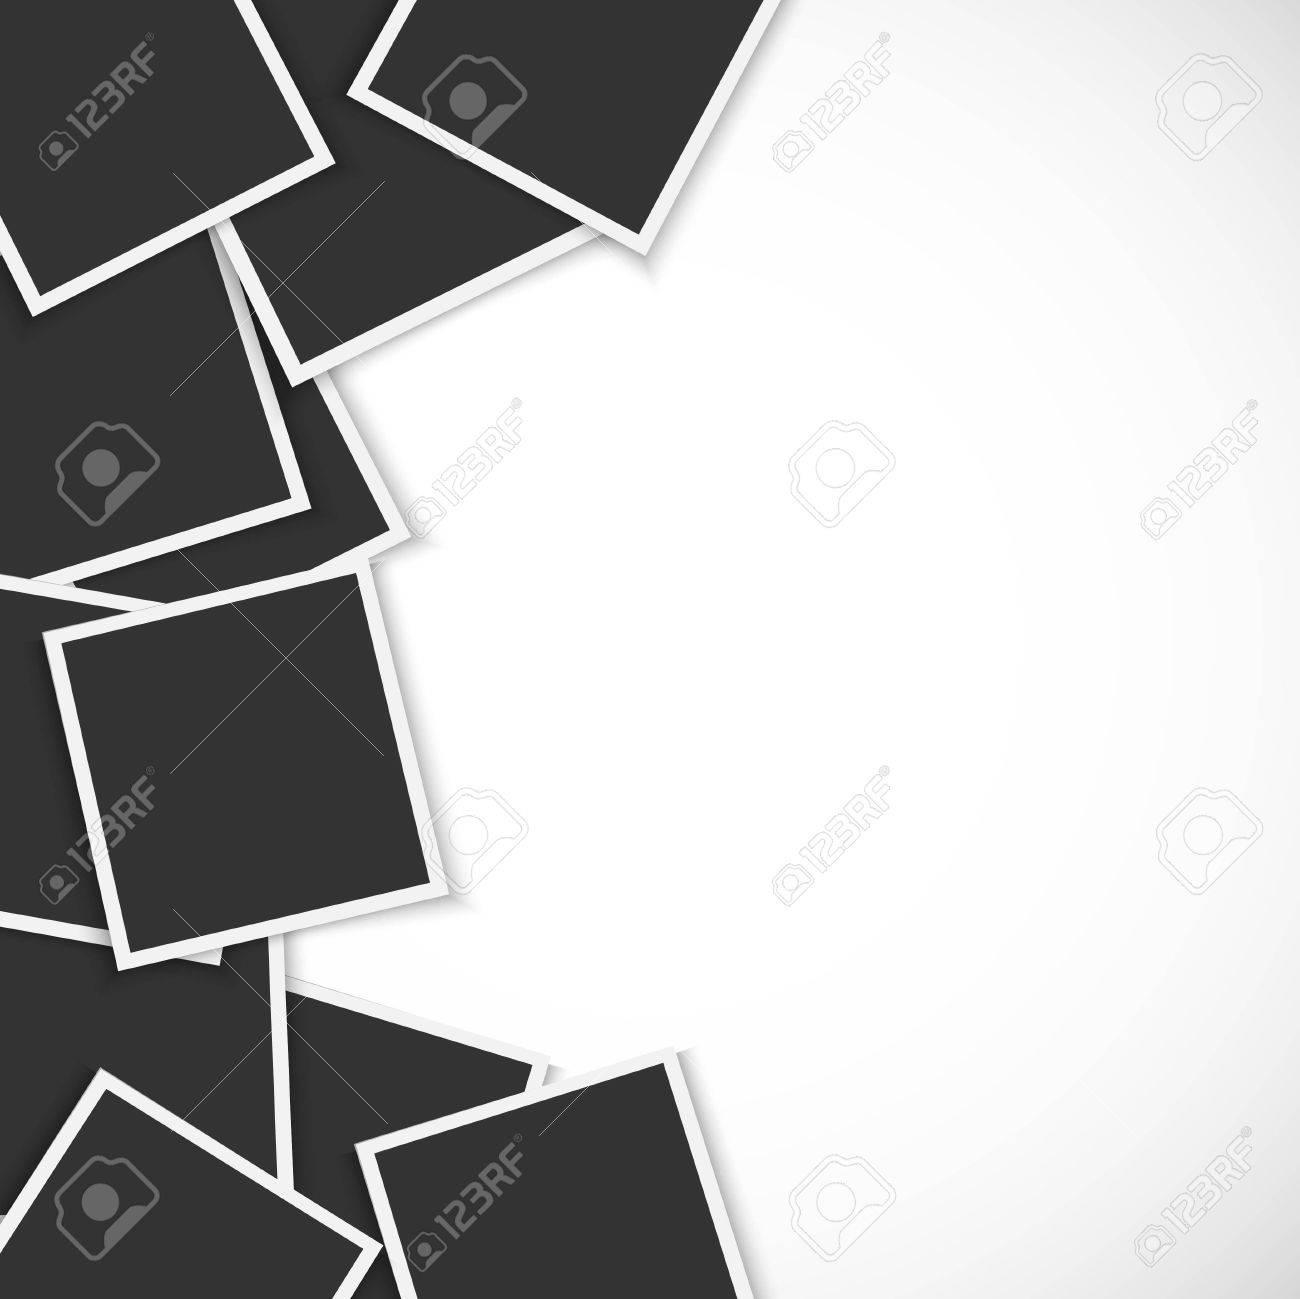 Pile of photo frames on white background - 51679168